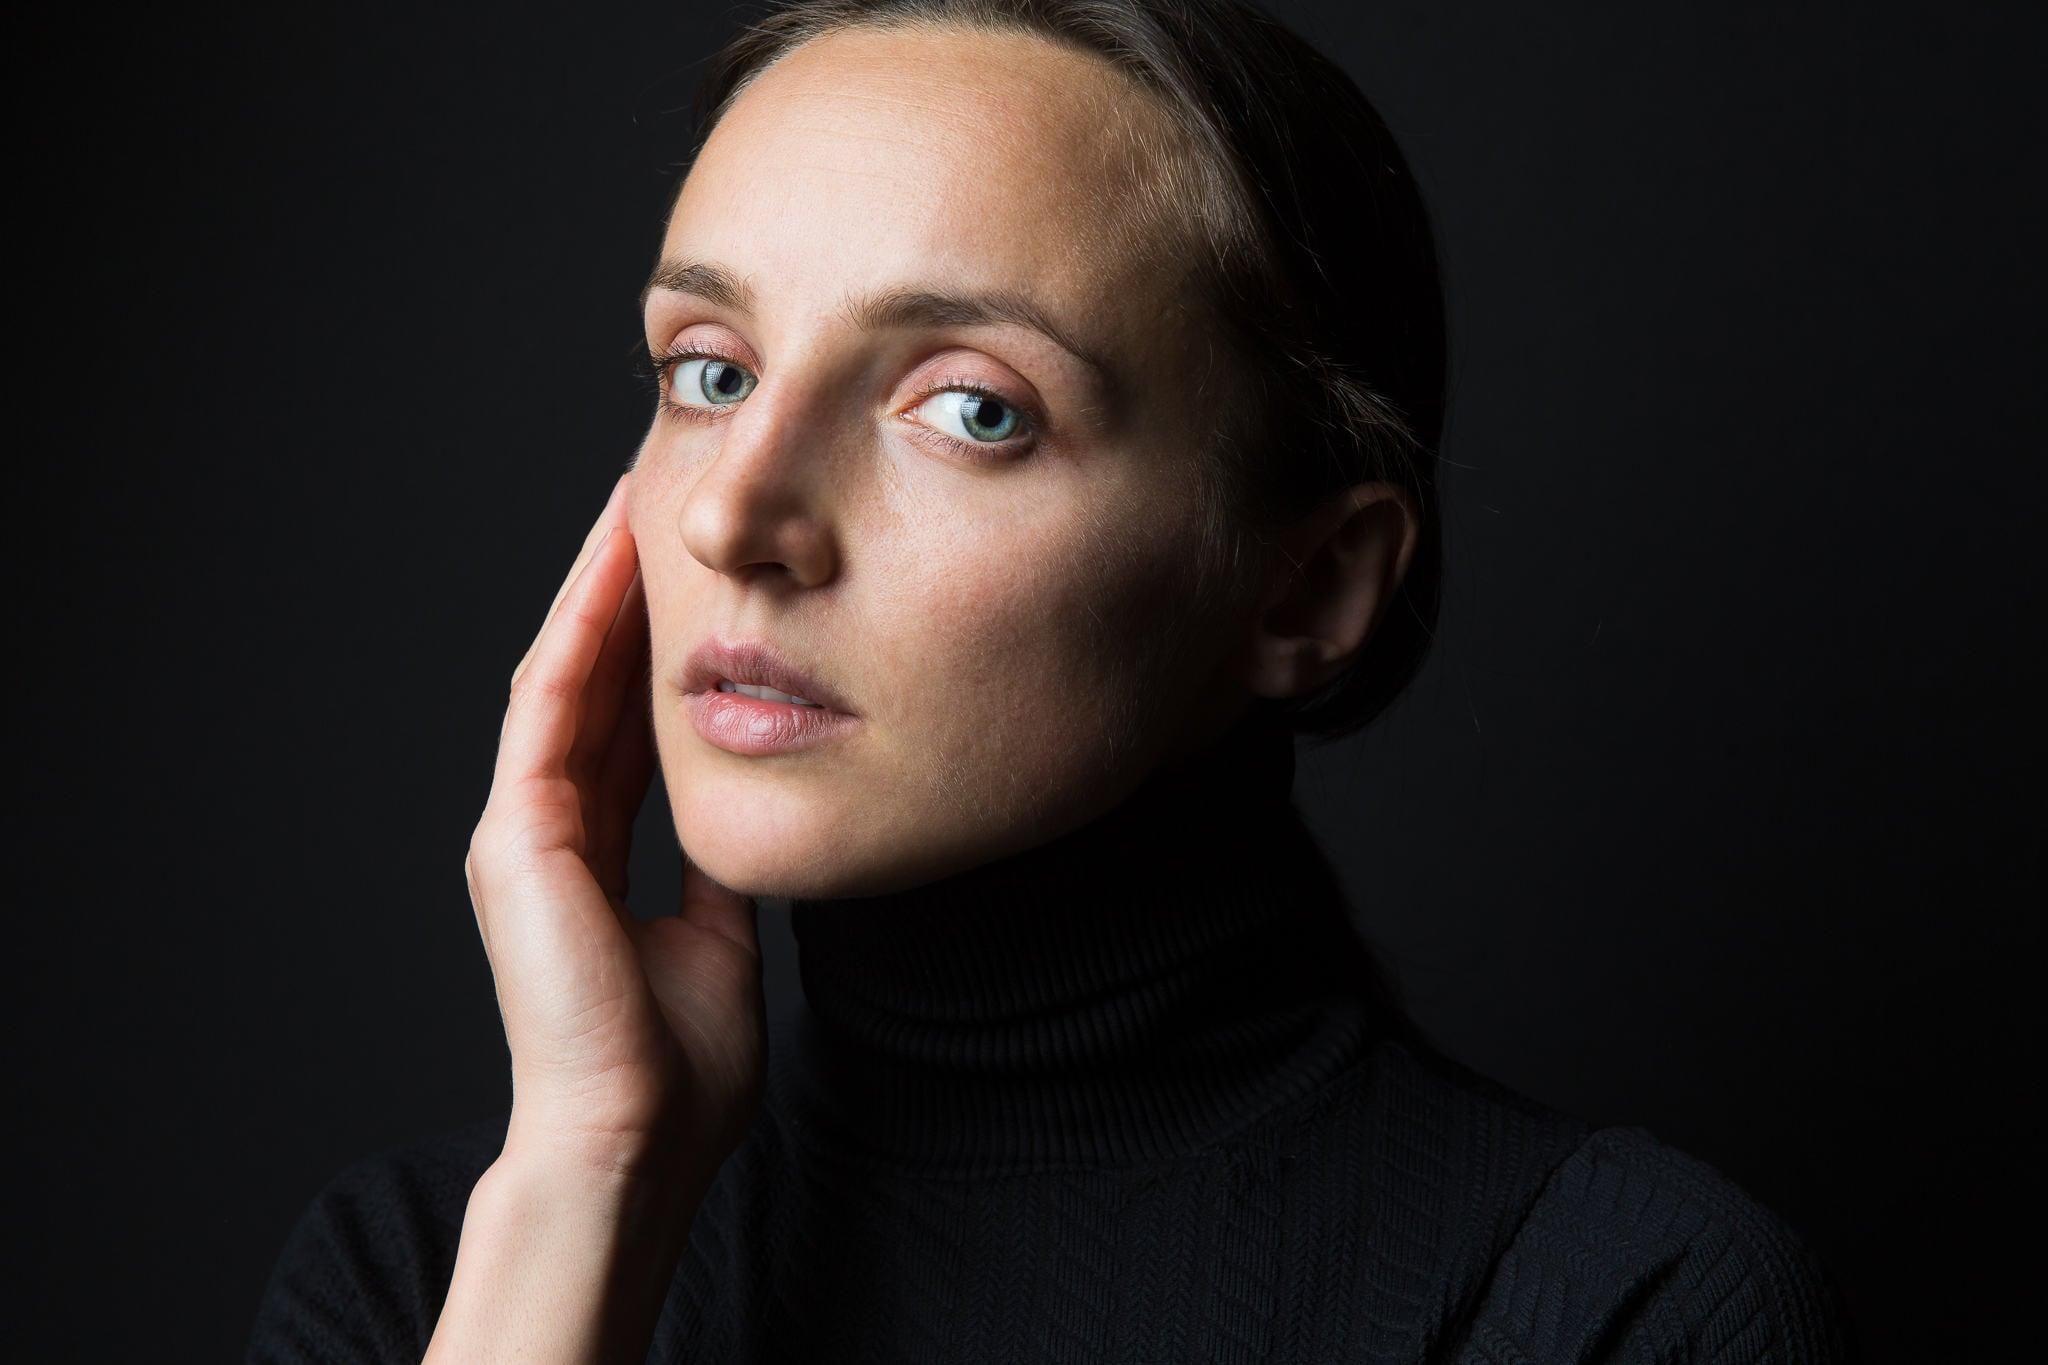 20160104 Anastasia-Products-Portrait-Studio-2994-Edit.jpg